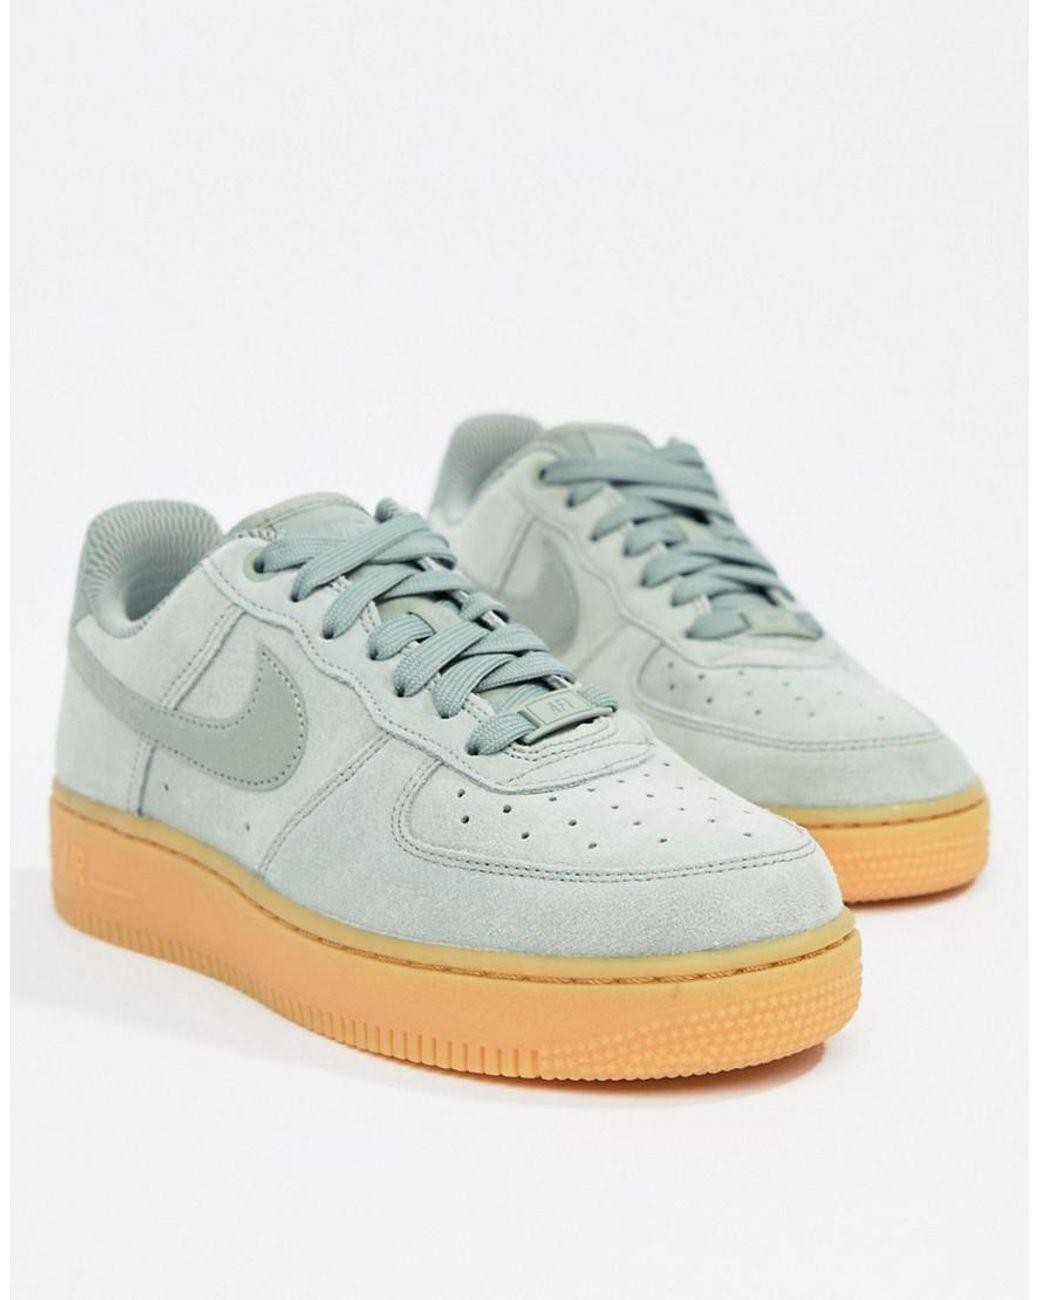 nike gum sole shoes